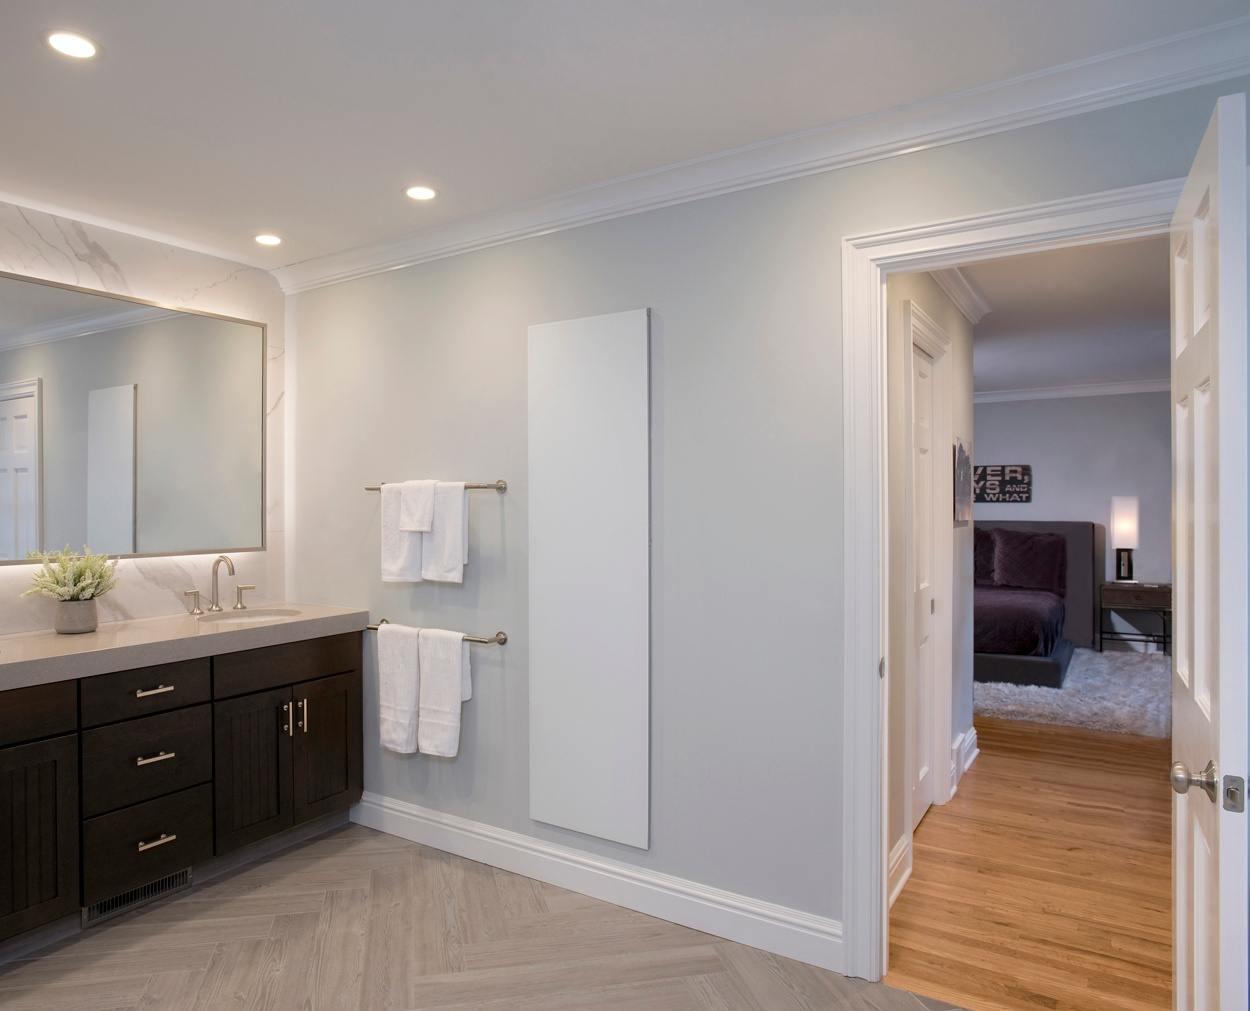 master bedroom can be seen through the door of this well designed master bedroom suite